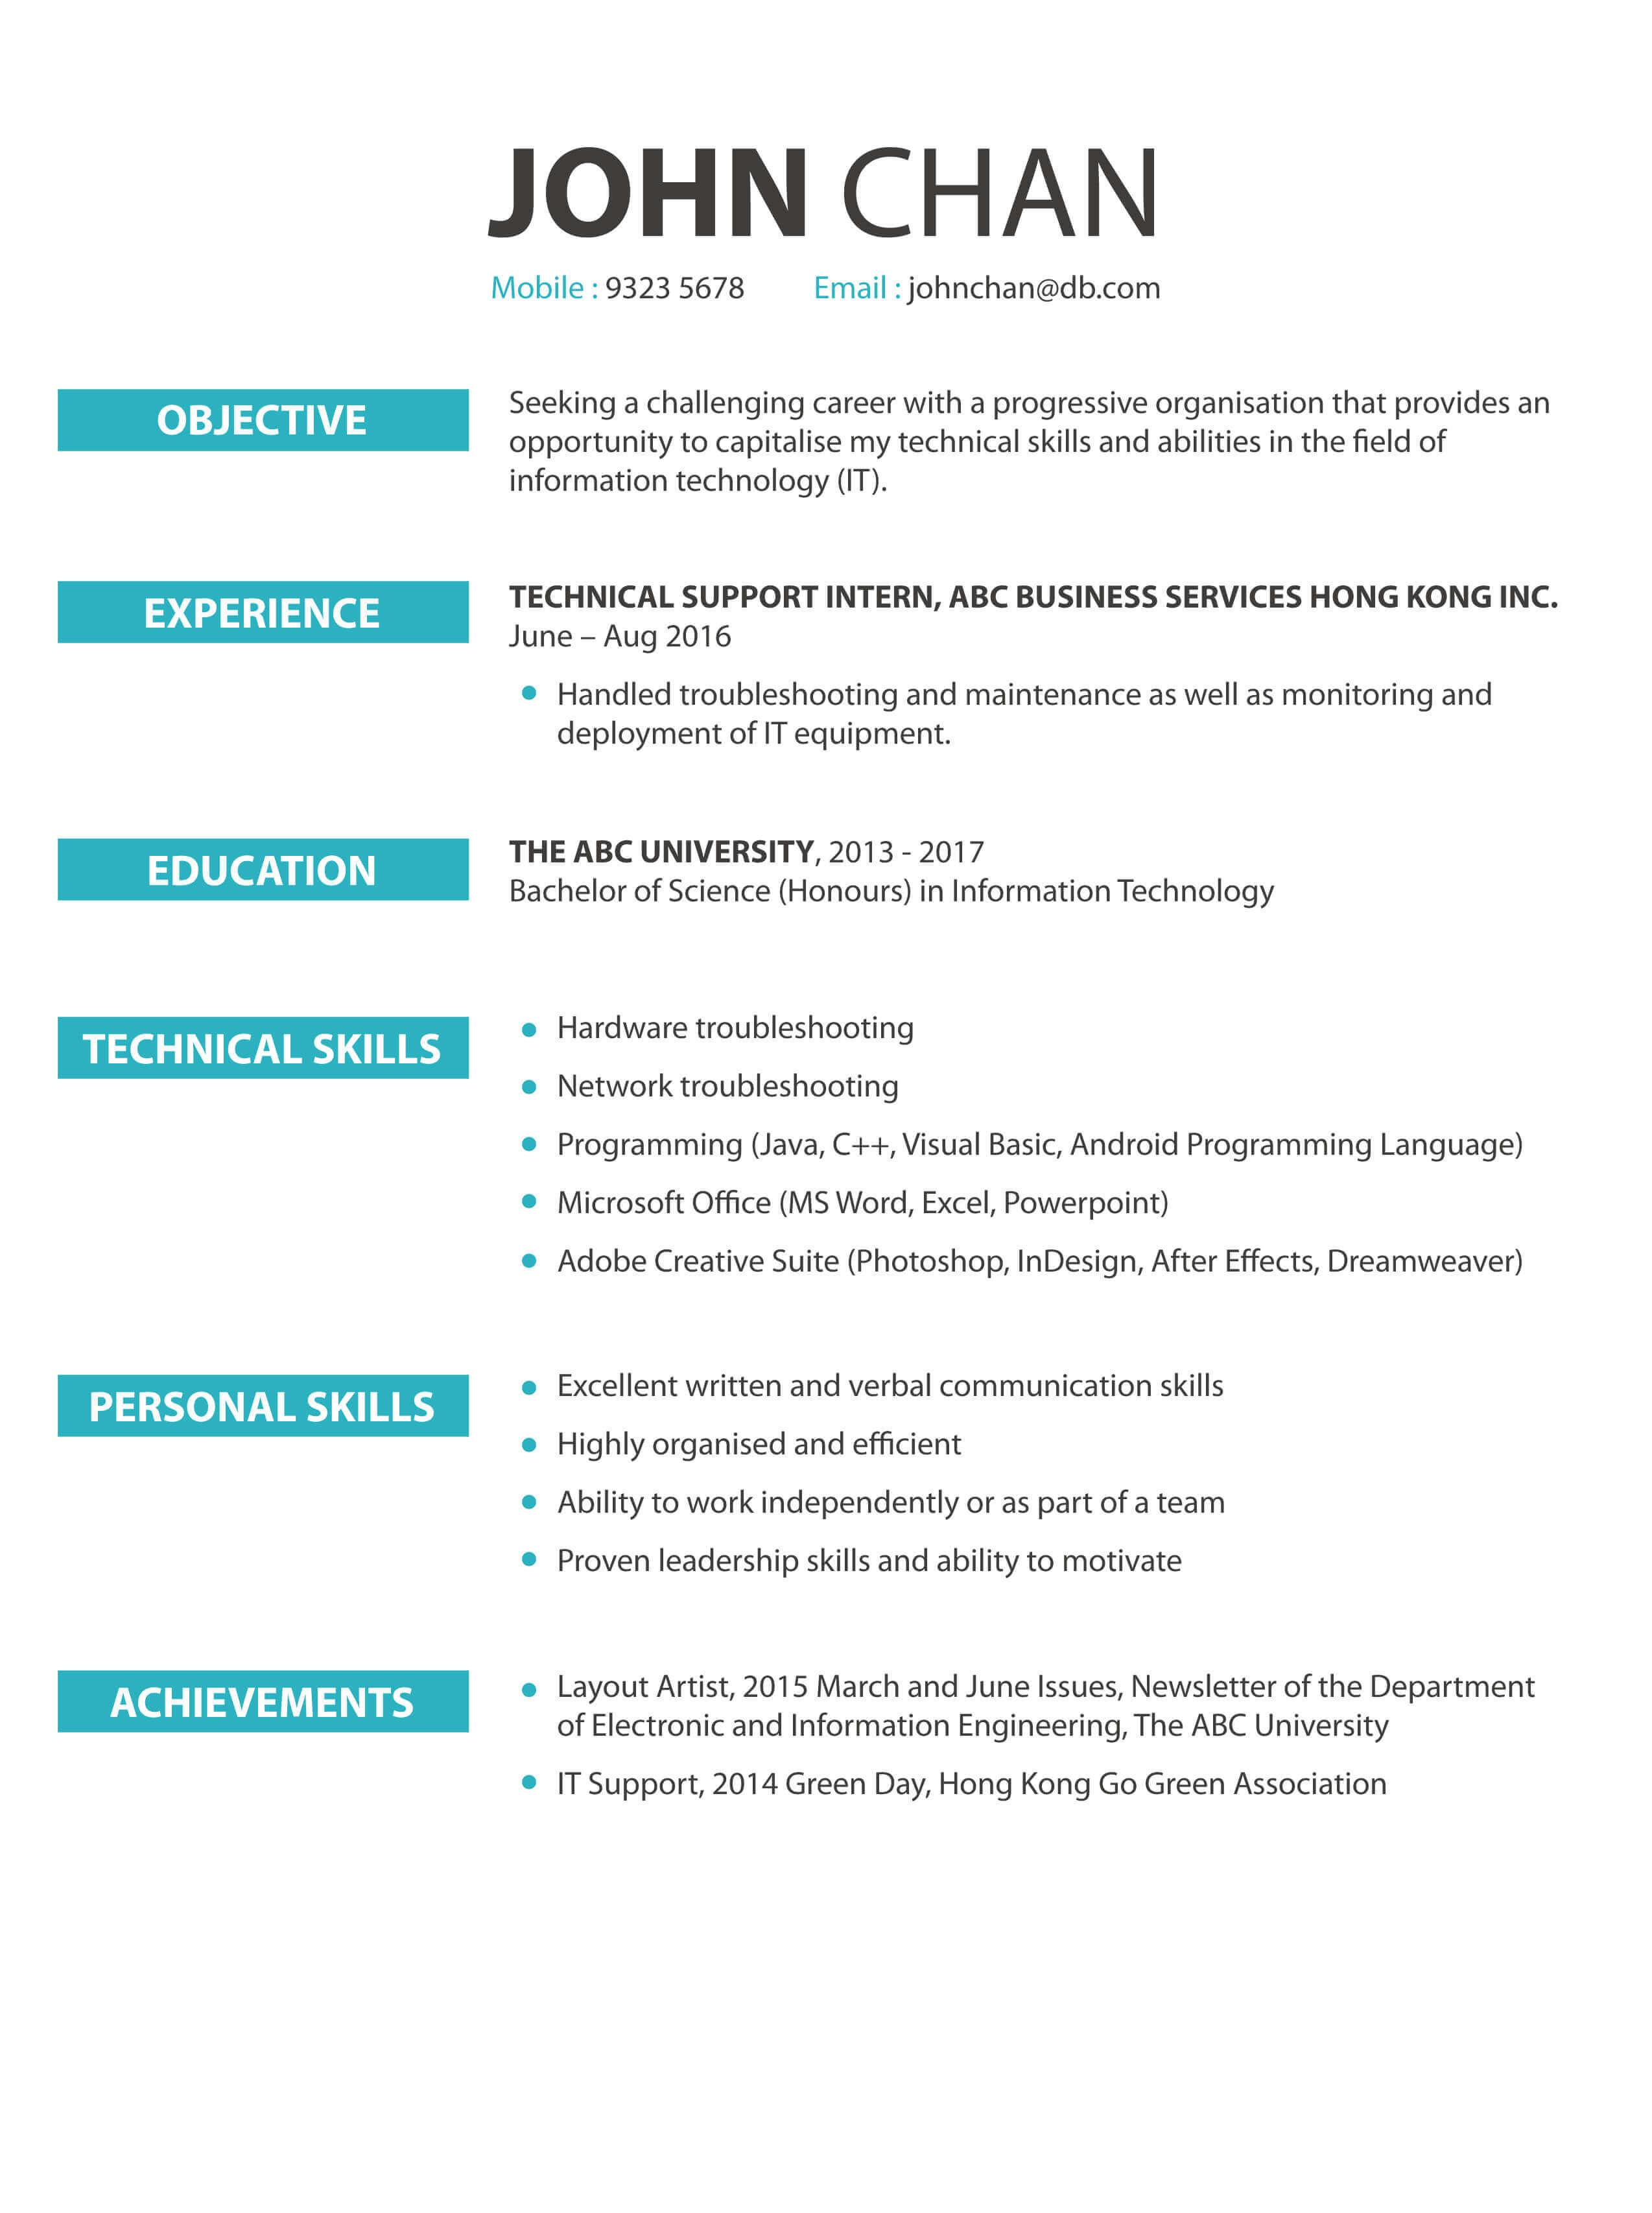 CV cover letter - Information Technology (IT)